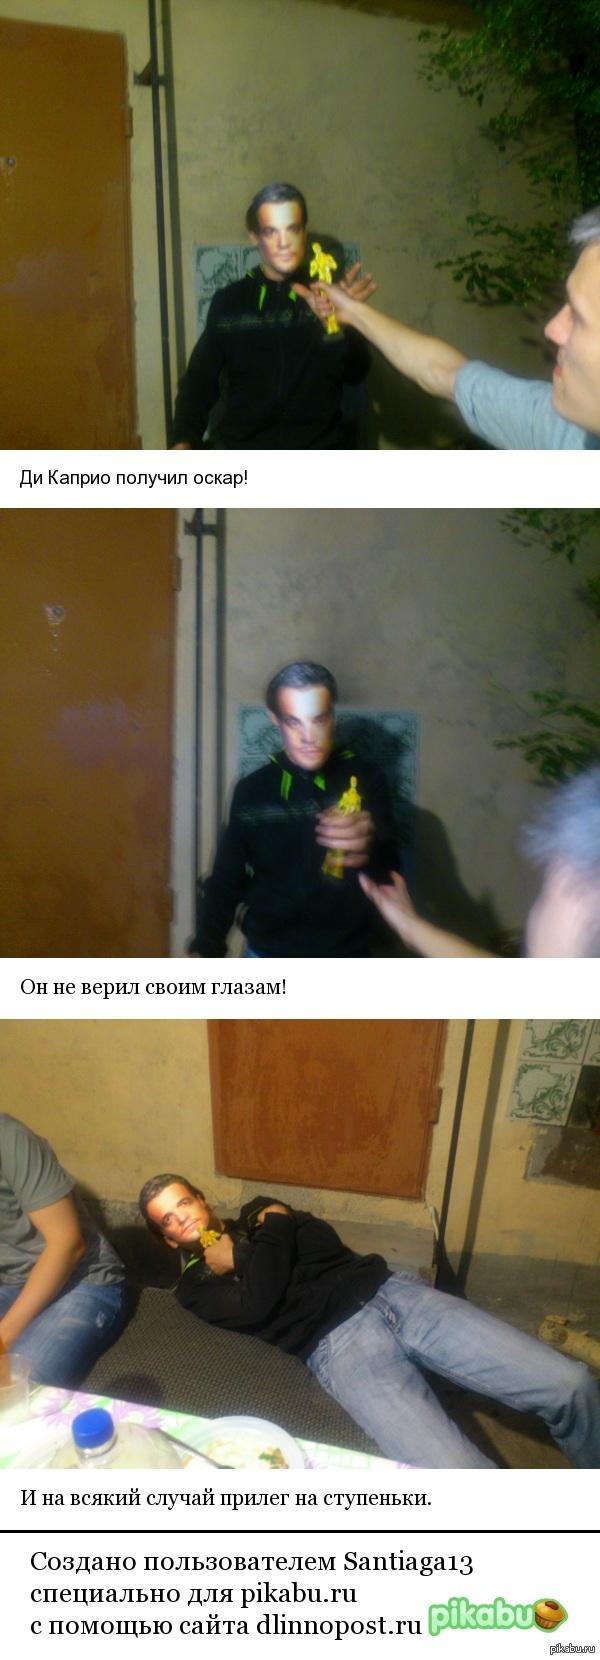 "В ответ на пост   Леонардо получил свой ОСКАР! <a href=""http://pikabu.ru/story/_3105251"">http://pikabu.ru/story/_3105251</a> Извините за качество фоток - сумерки и плохое освещение. Жириновский в комментах."